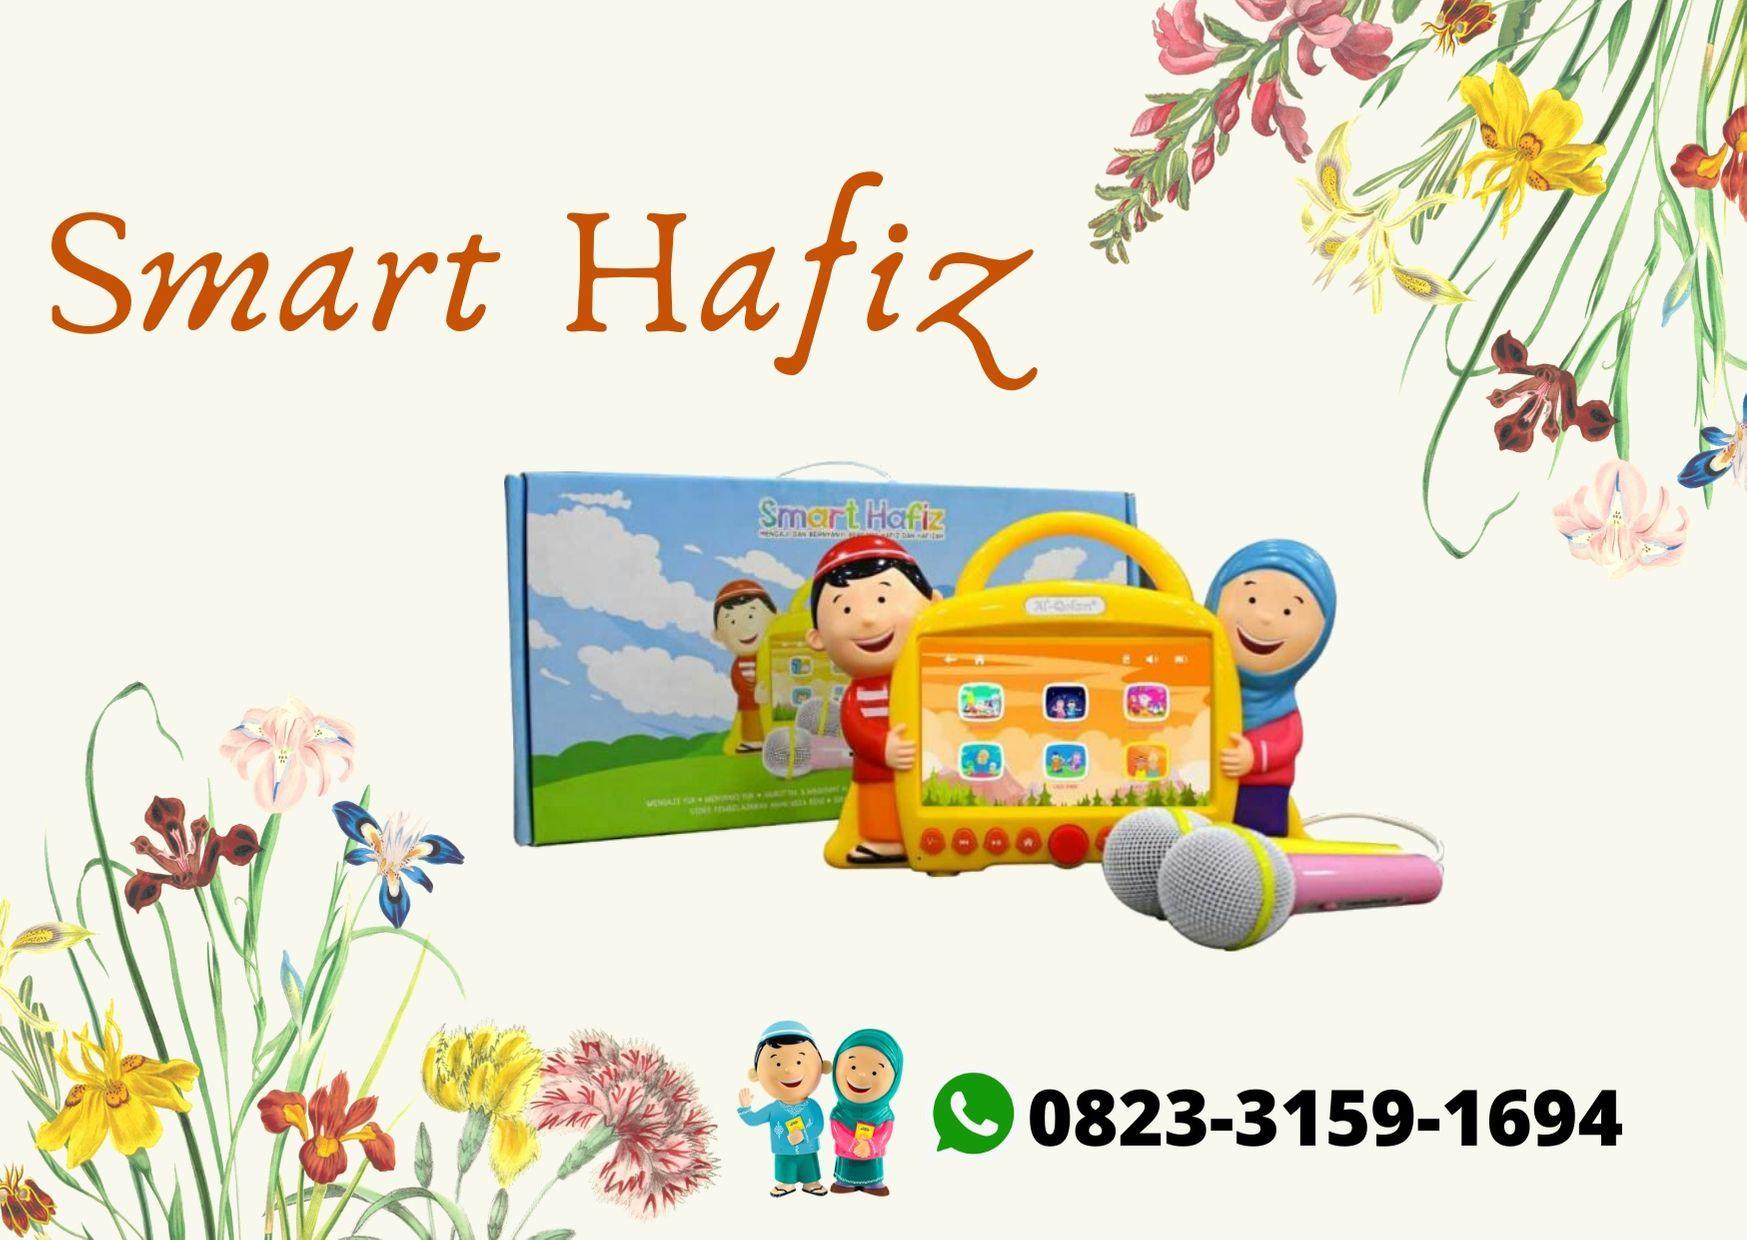 SMART HAFIZ merupakan Inovasi terbaru dari Al Qolam